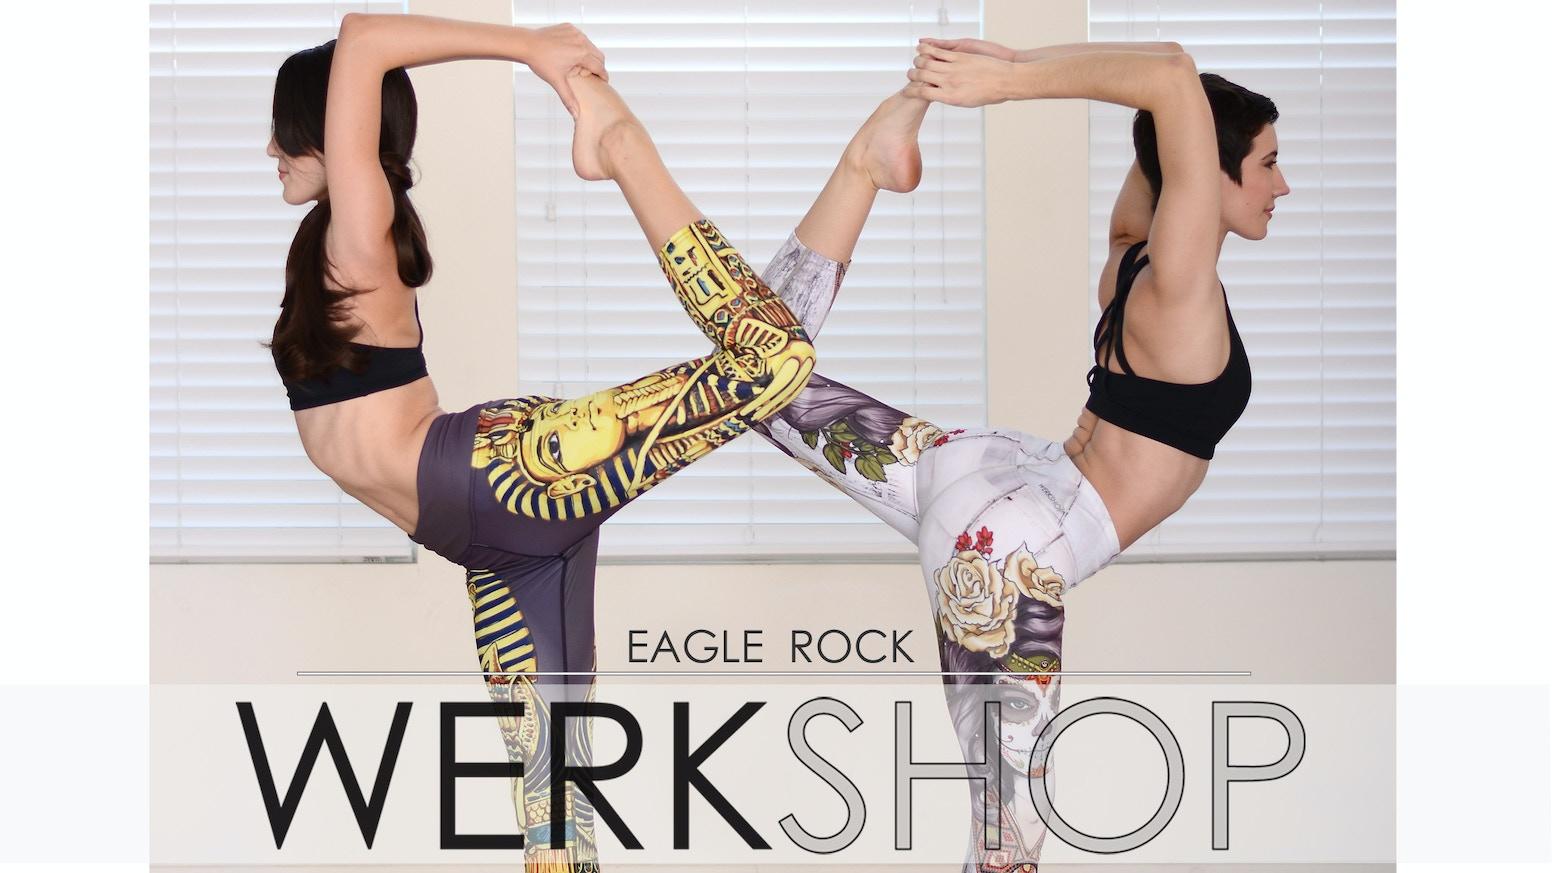 Designed for Fitness | Styled for Fashion®, Eagle Rock WERKSHOP® leggings.